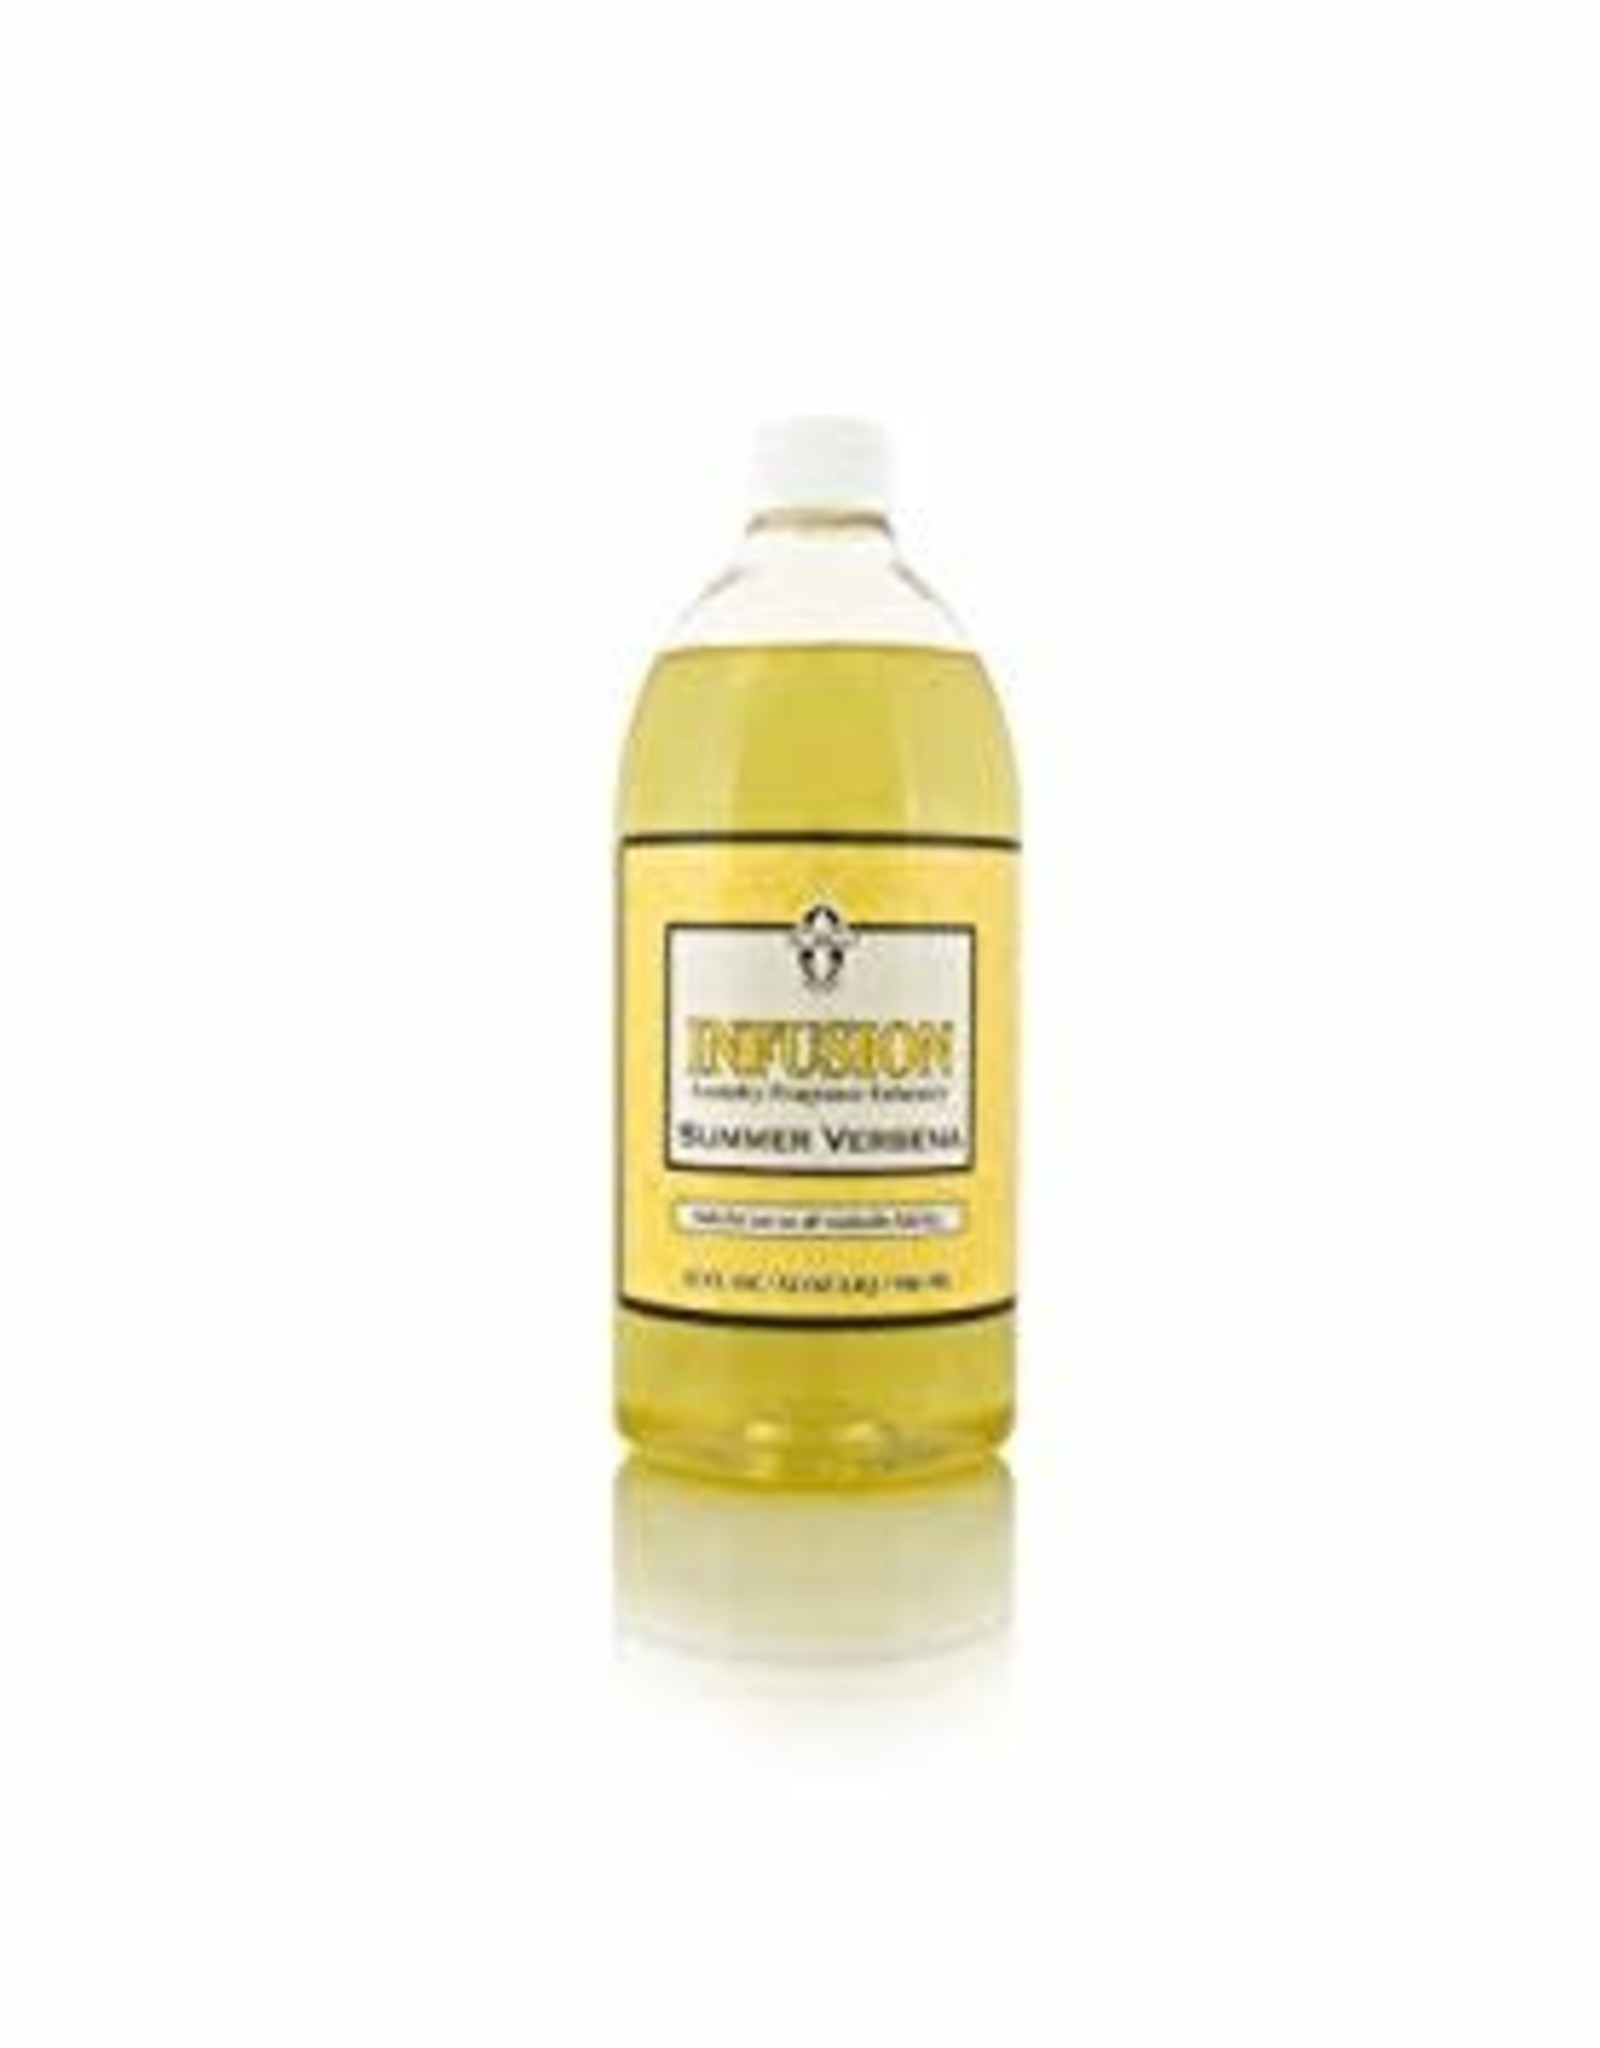 Le Blanc Le Blanc - Infusion Linen Wash - Summer Verbena 32 oz